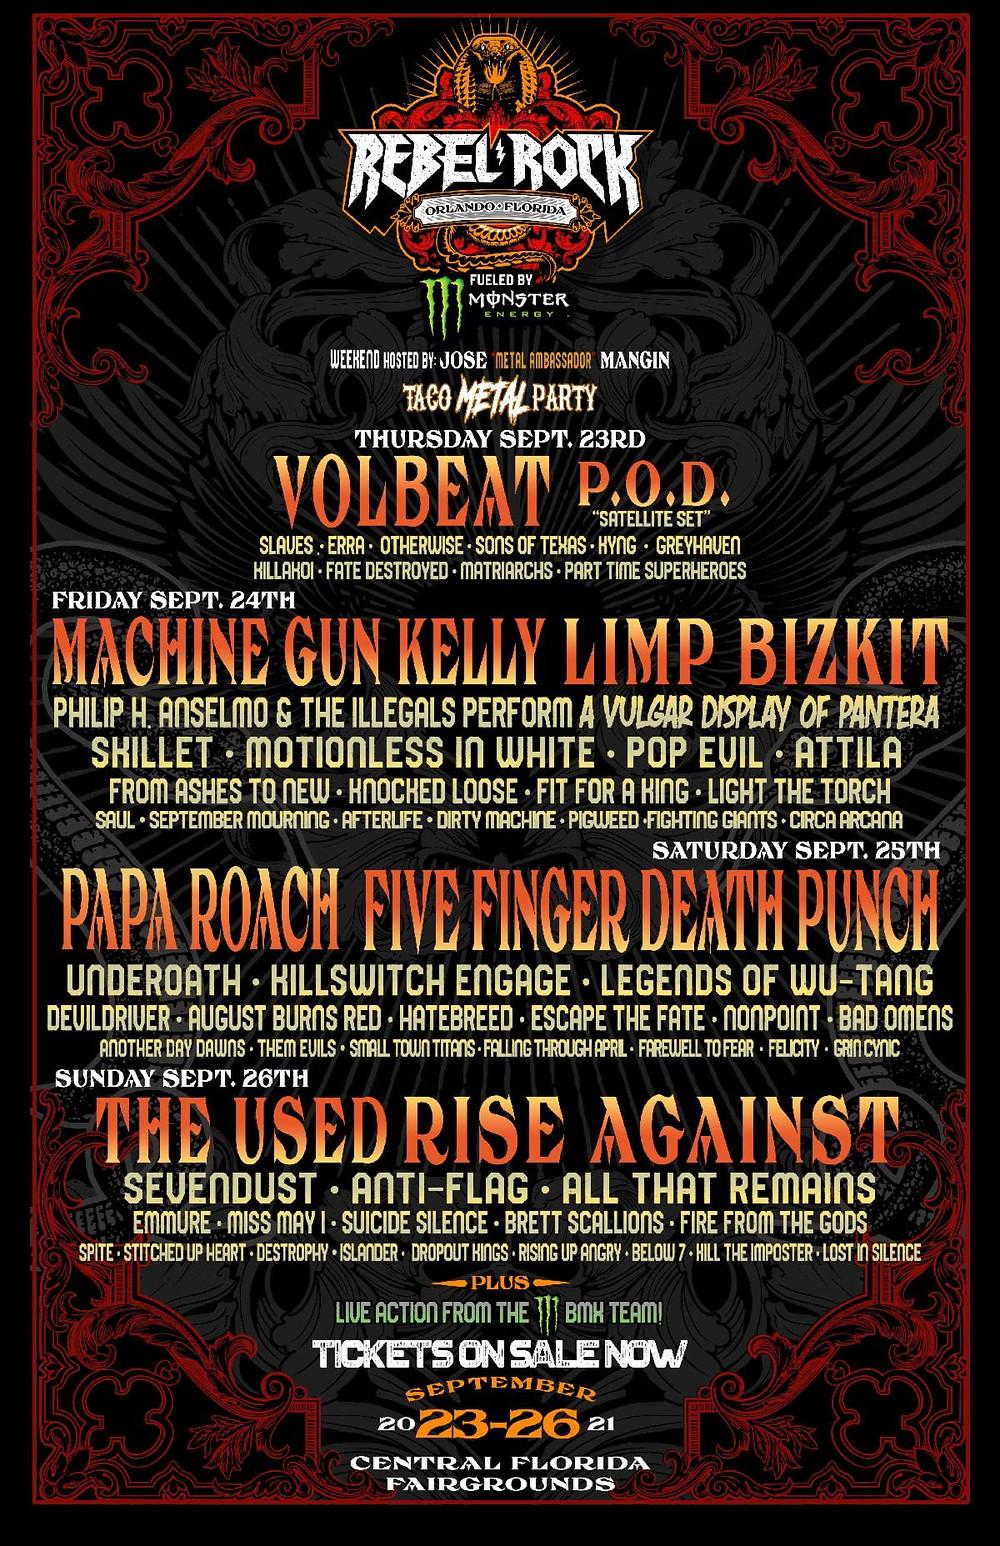 Four Chord Music Fest